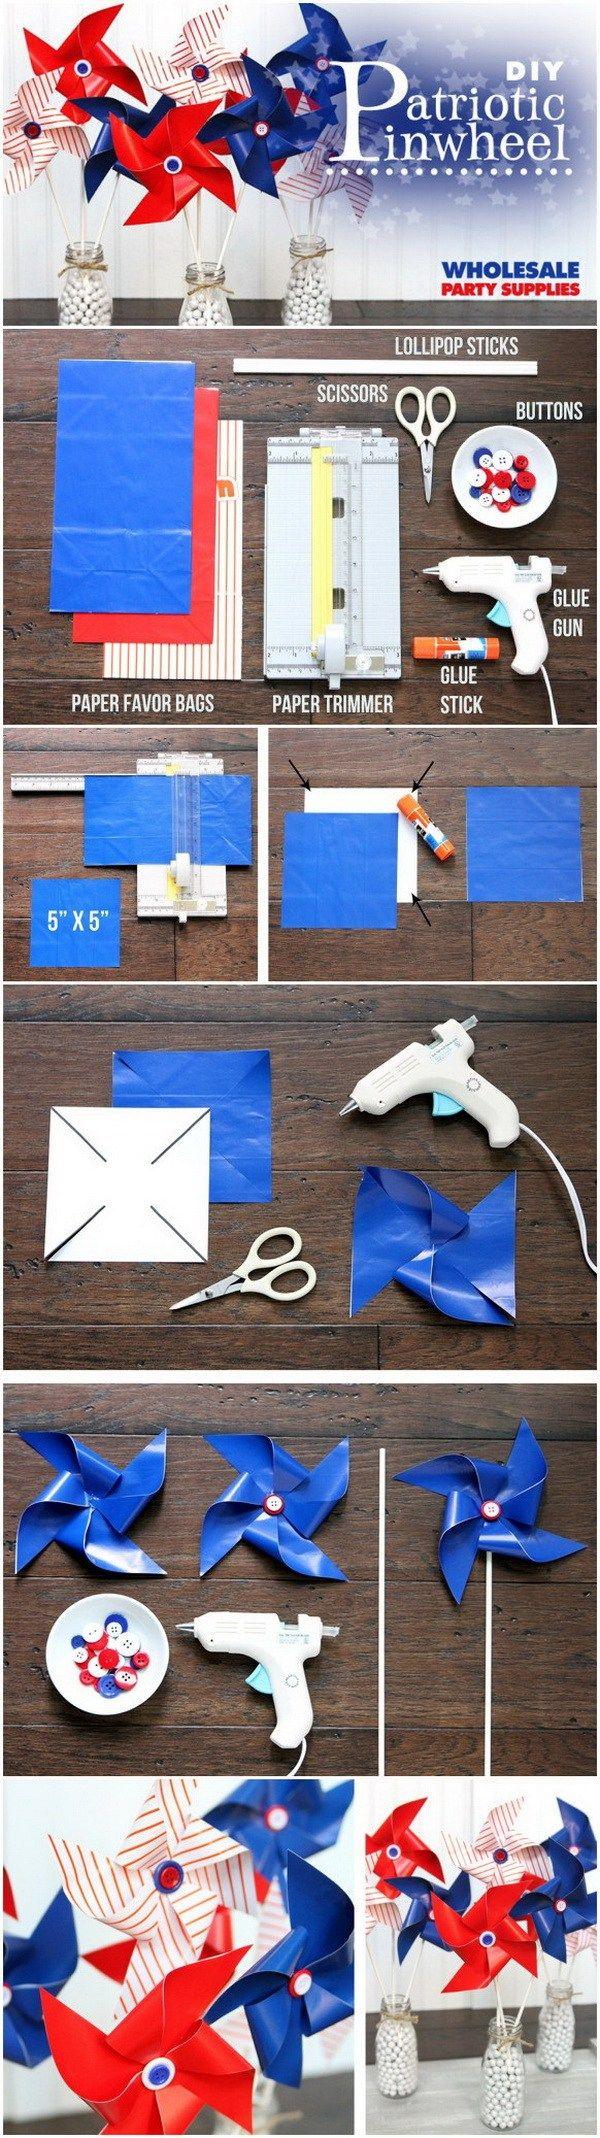 DIY 4th of July Decorations: DIY Patriotic Paper Pinwheel.